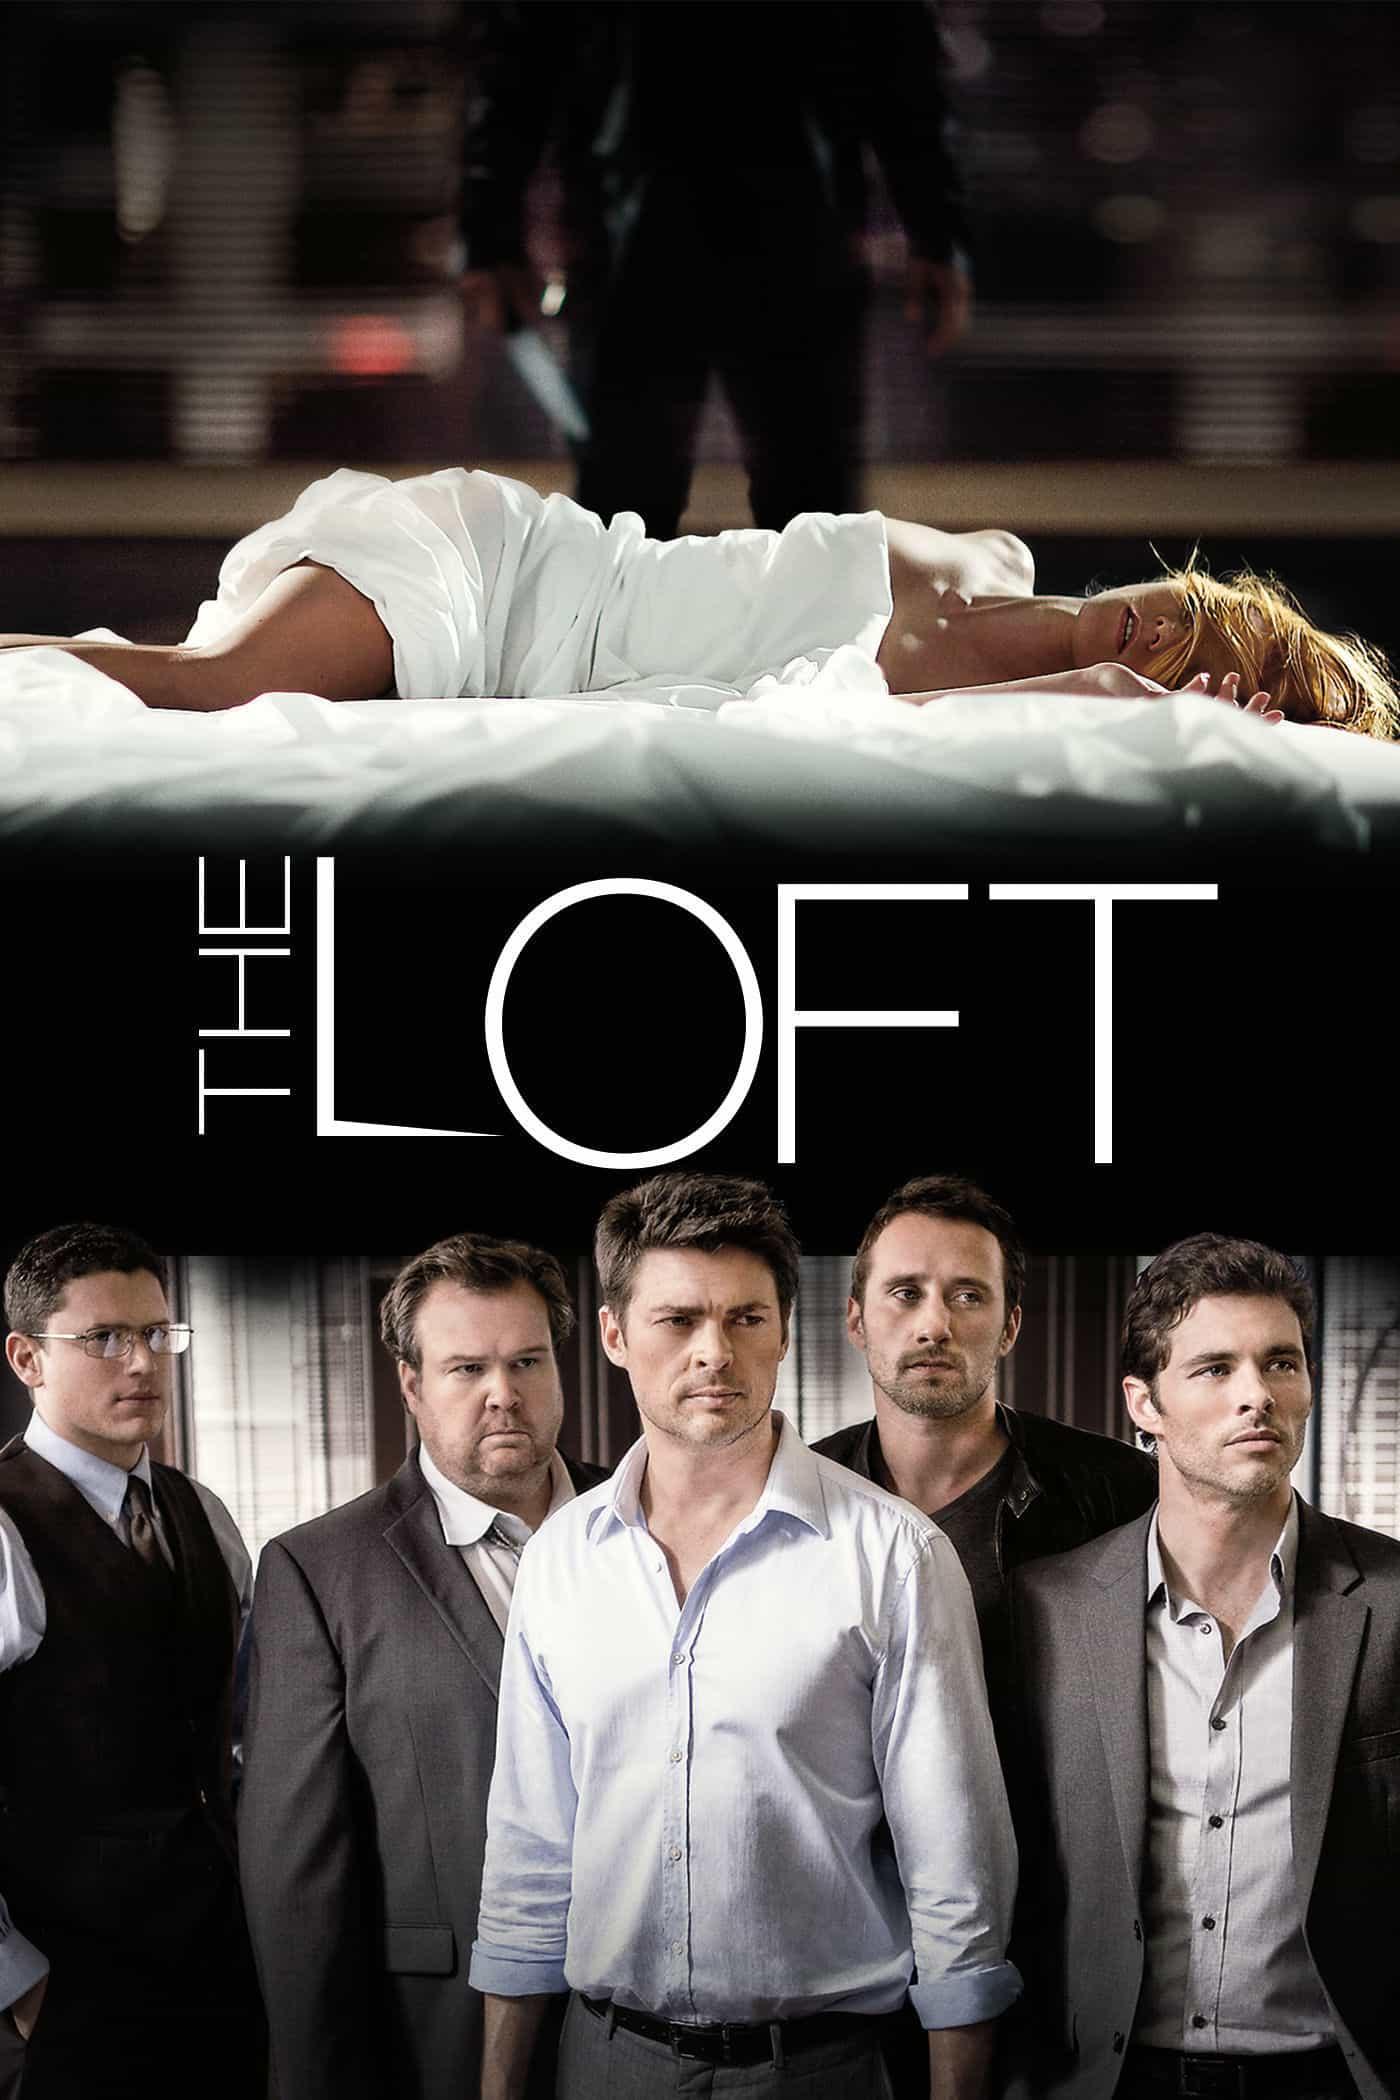 The Loft, 2014